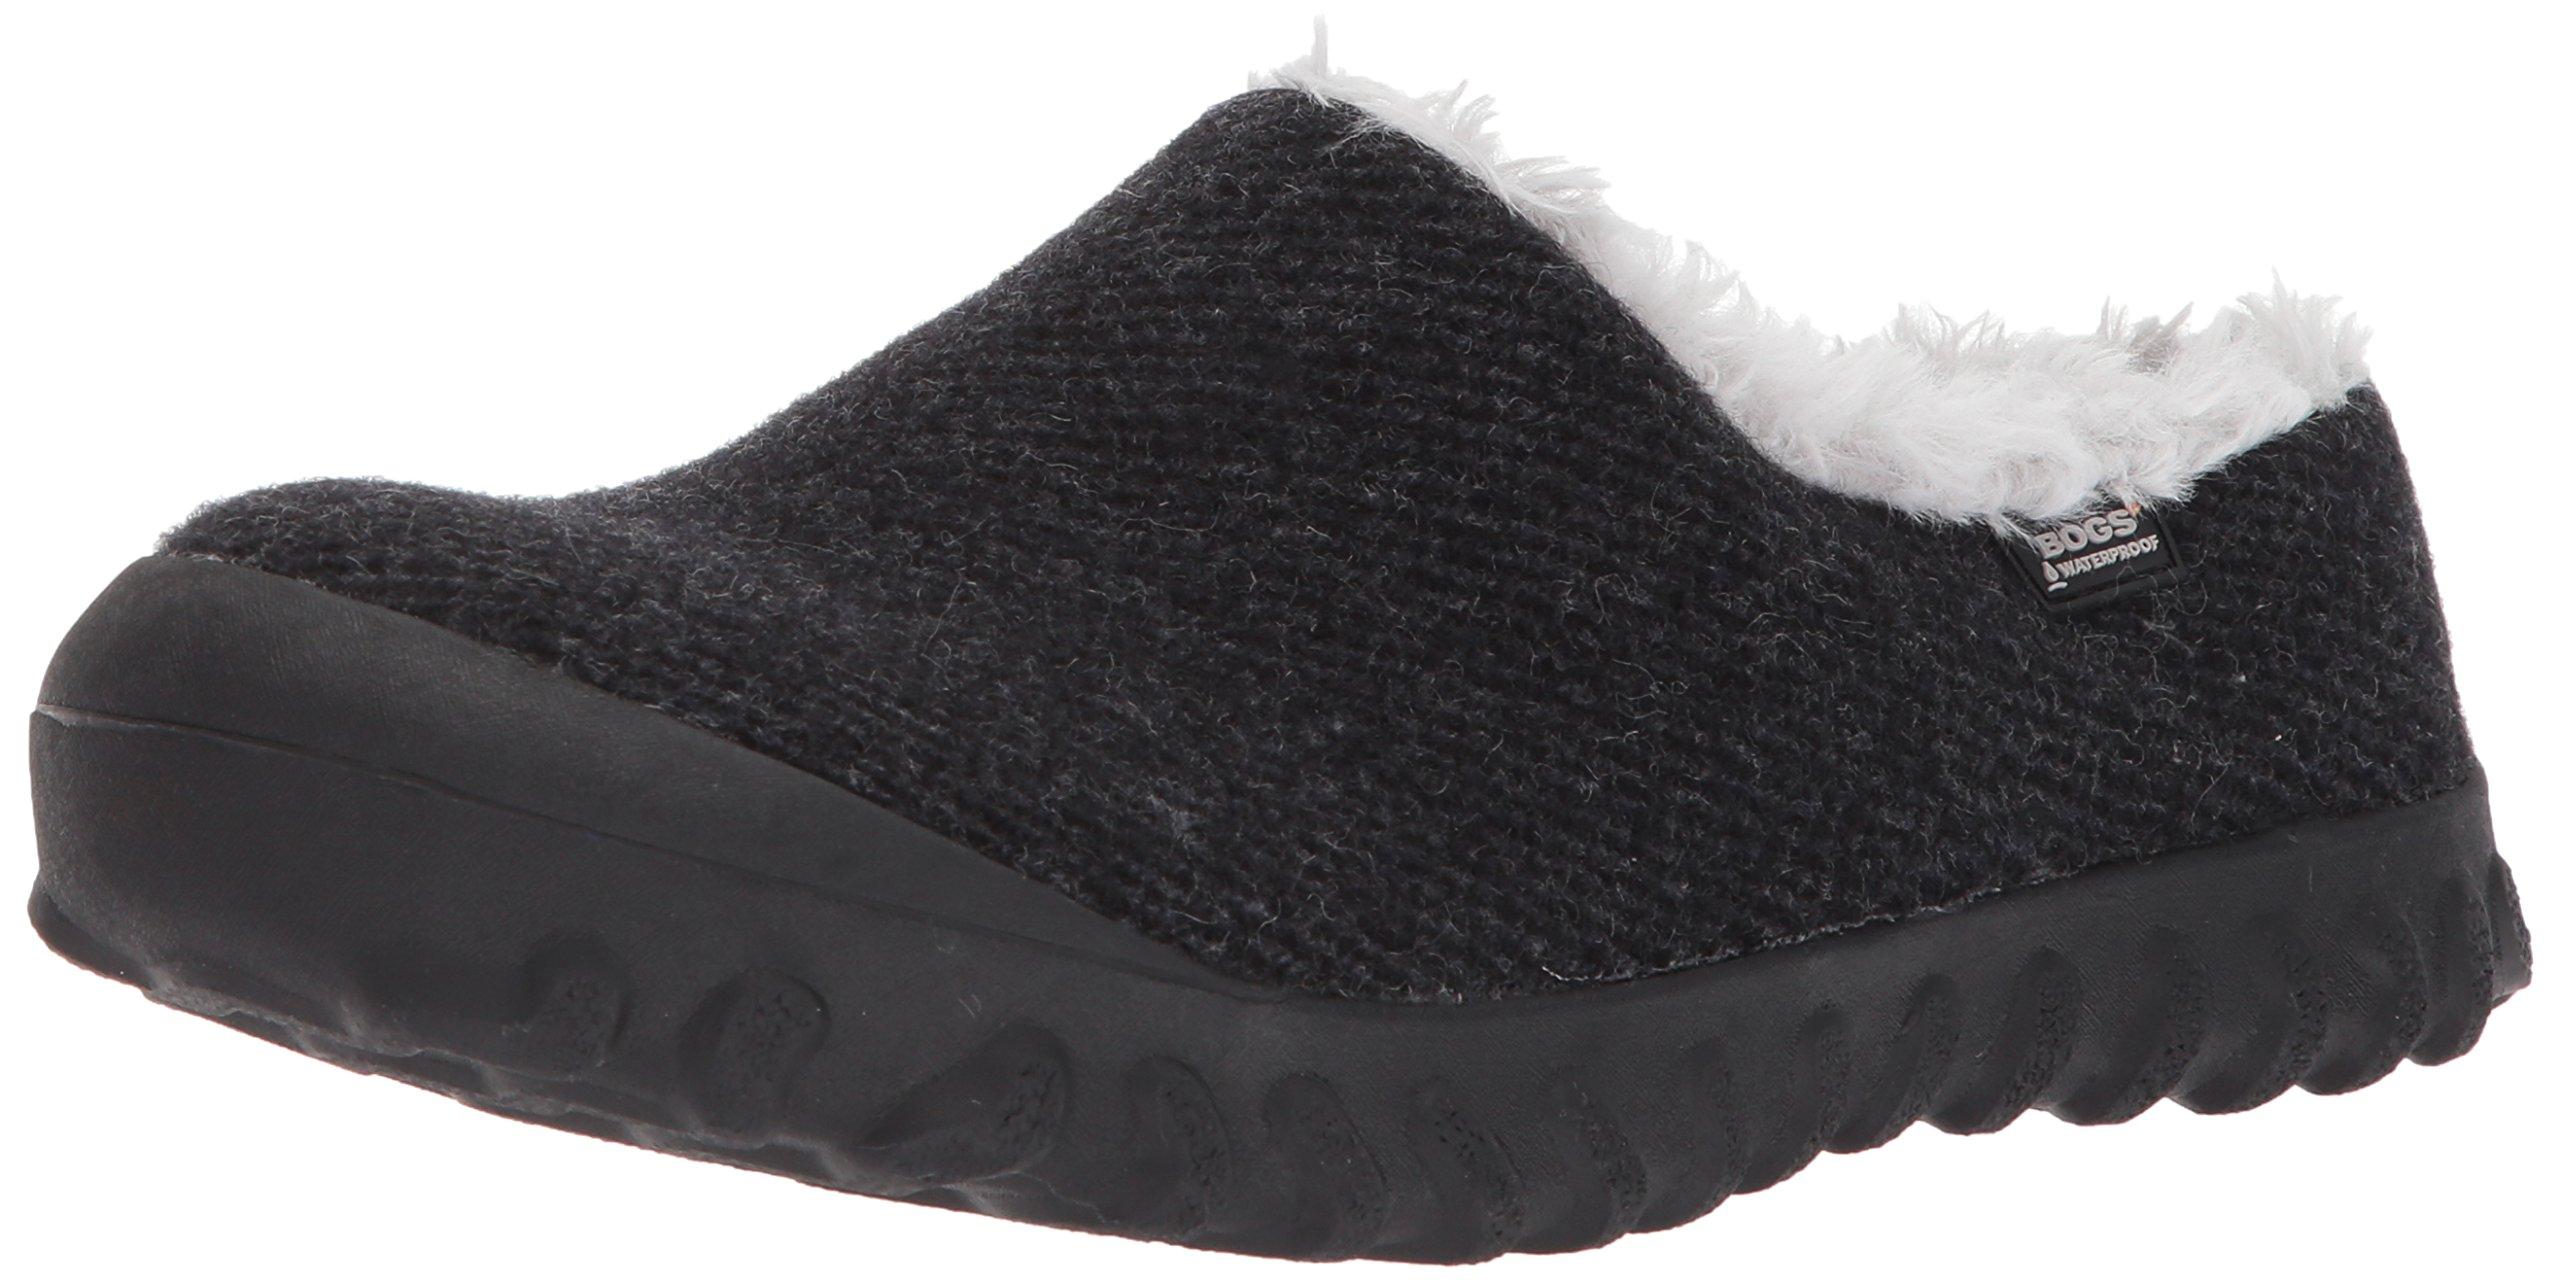 Bogs Women's Bmoc Slip on Wool Snow Boot, Black, 9 M US